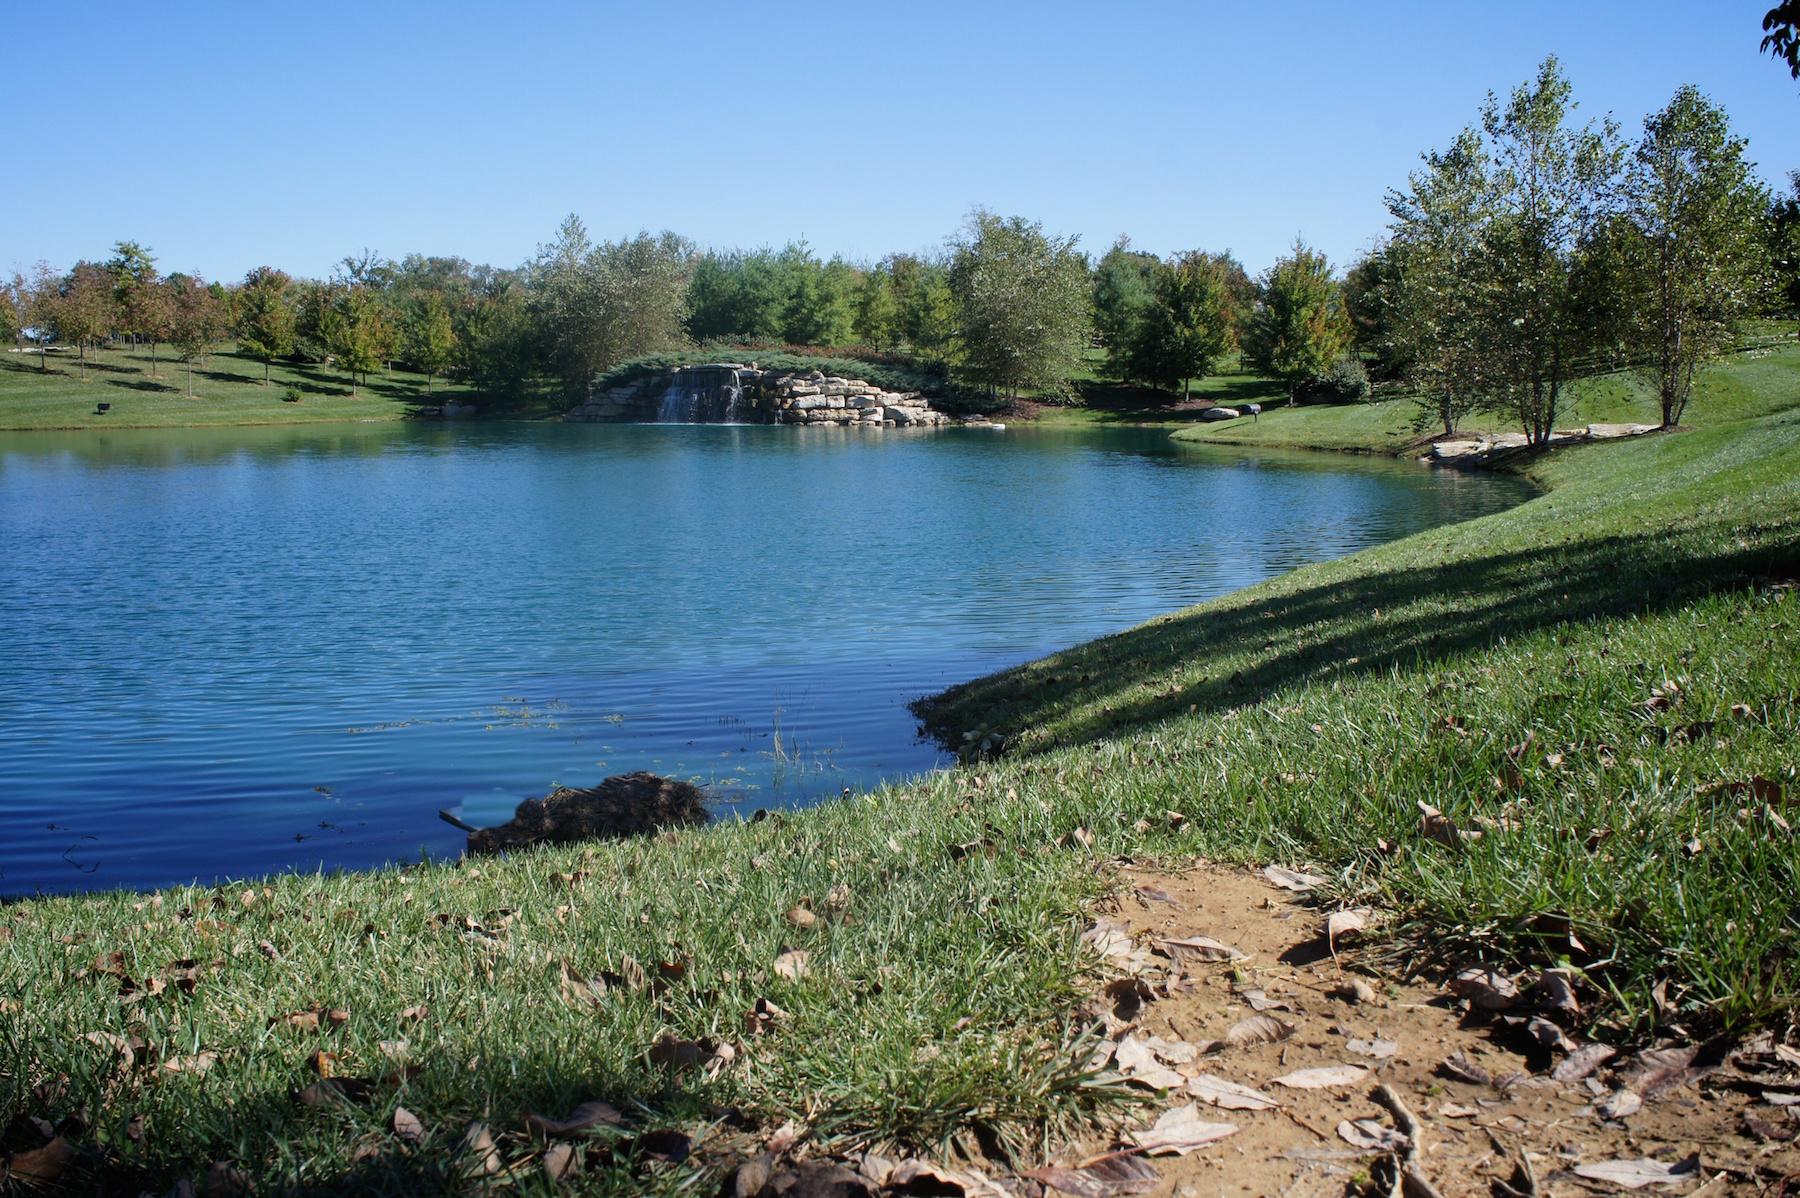 Terreno por un Venta en 12443 Poplar Woods Drive Prospect, Kentucky, 40059 Estados Unidos